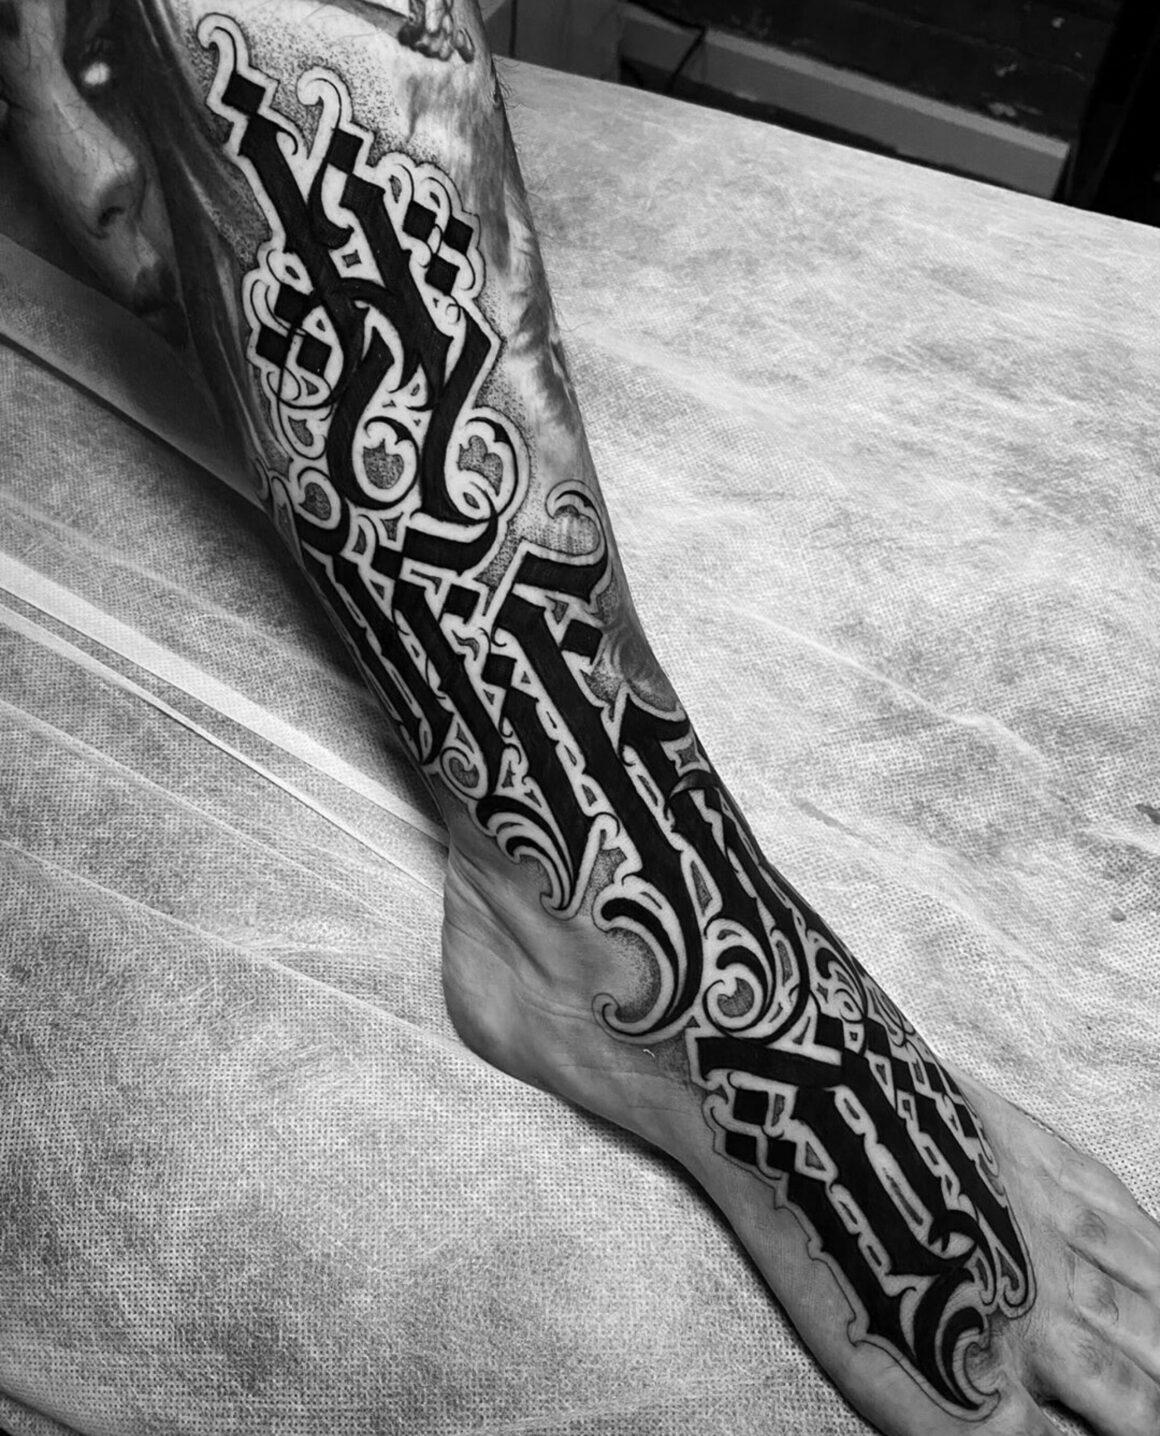 Mayonaize, Capital Tattoo, Melbourne, Australia